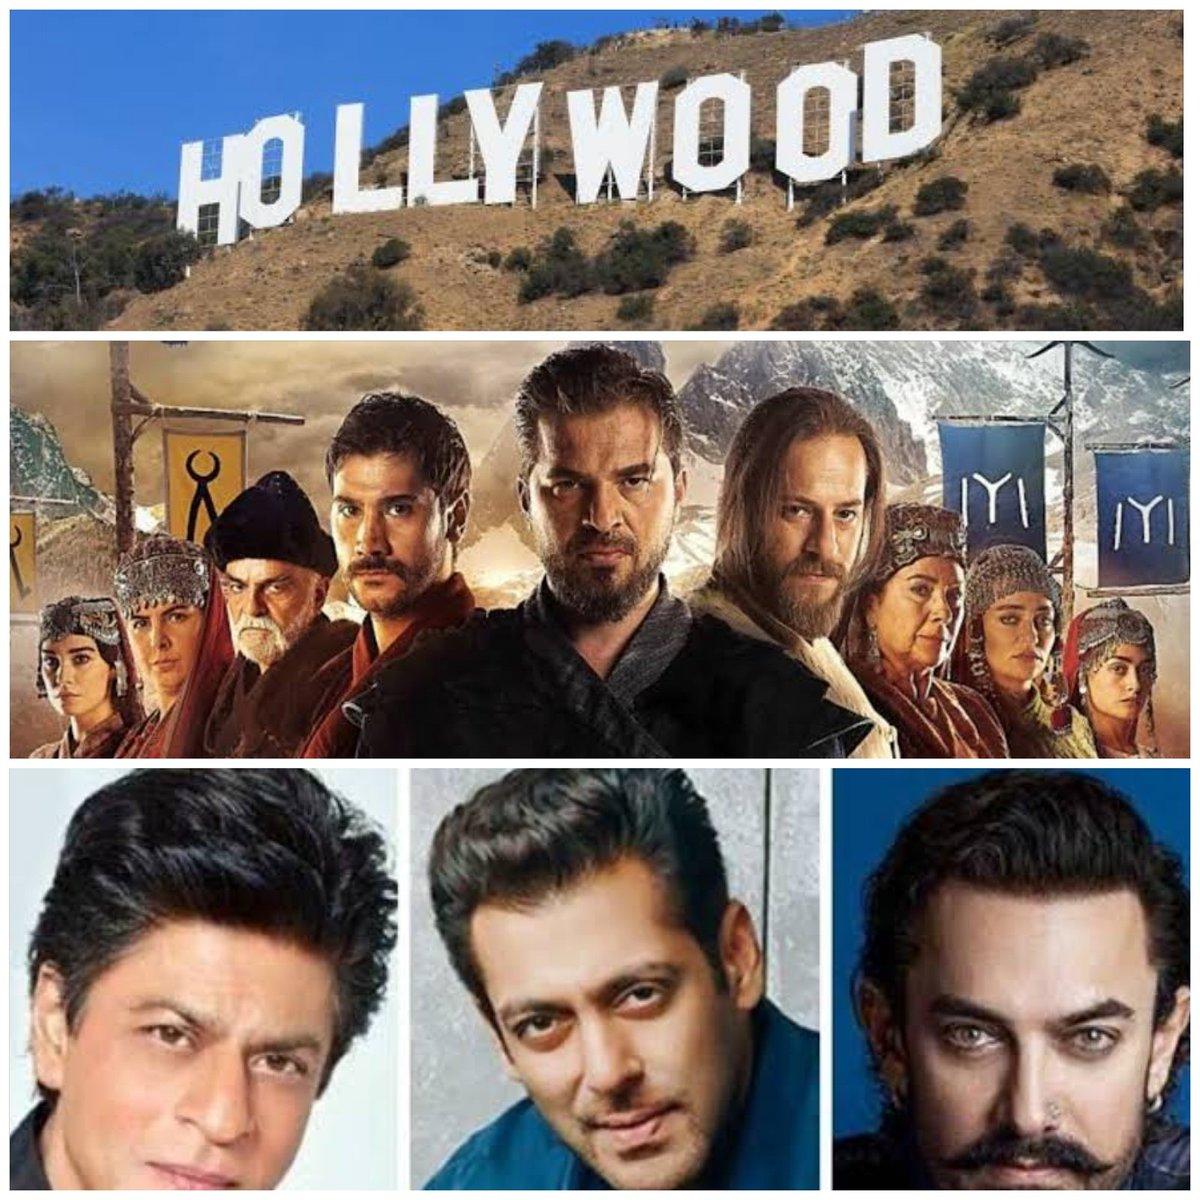 Hollywood and bollywood after ertugrul??? https://t.co/2PsRKM2zTO #KaranJohar #BollywoodDirt #LaxmiBombTrailer #AkshayKumar #instantbollywood #dirilişertuğrul #KurulusOsman #UyanısBueyuekSelcuklu #TurkishSeries #BollywoodDirt #Hollywood #scifi #collapse https://t.co/9NGO4h5GF4